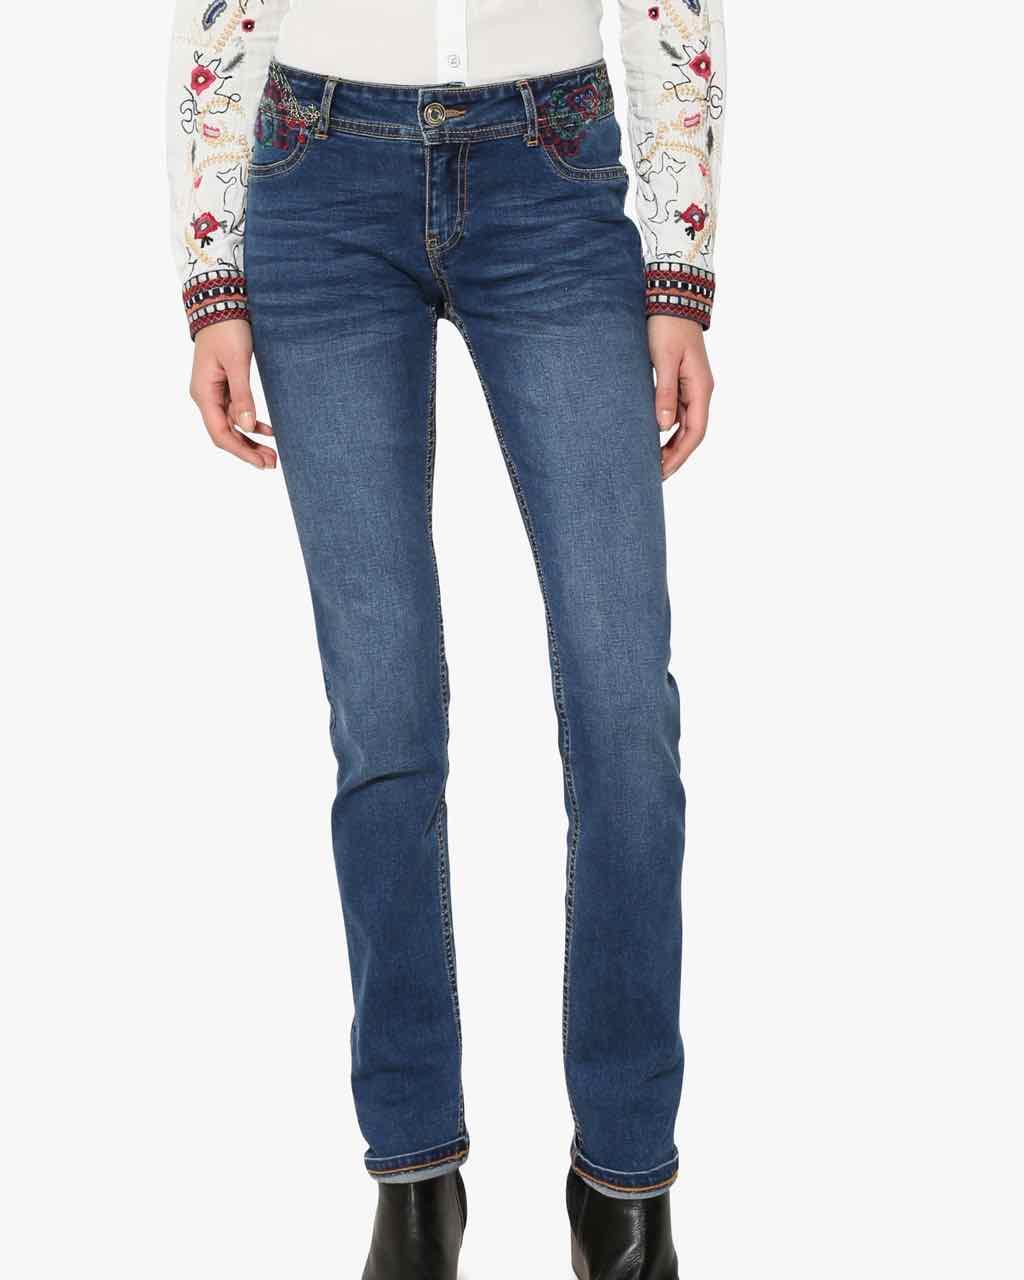 Us Online Canada 17wwdd15 Desigual Buy Refriposas Denim Jeans 0wXPpqaRxn